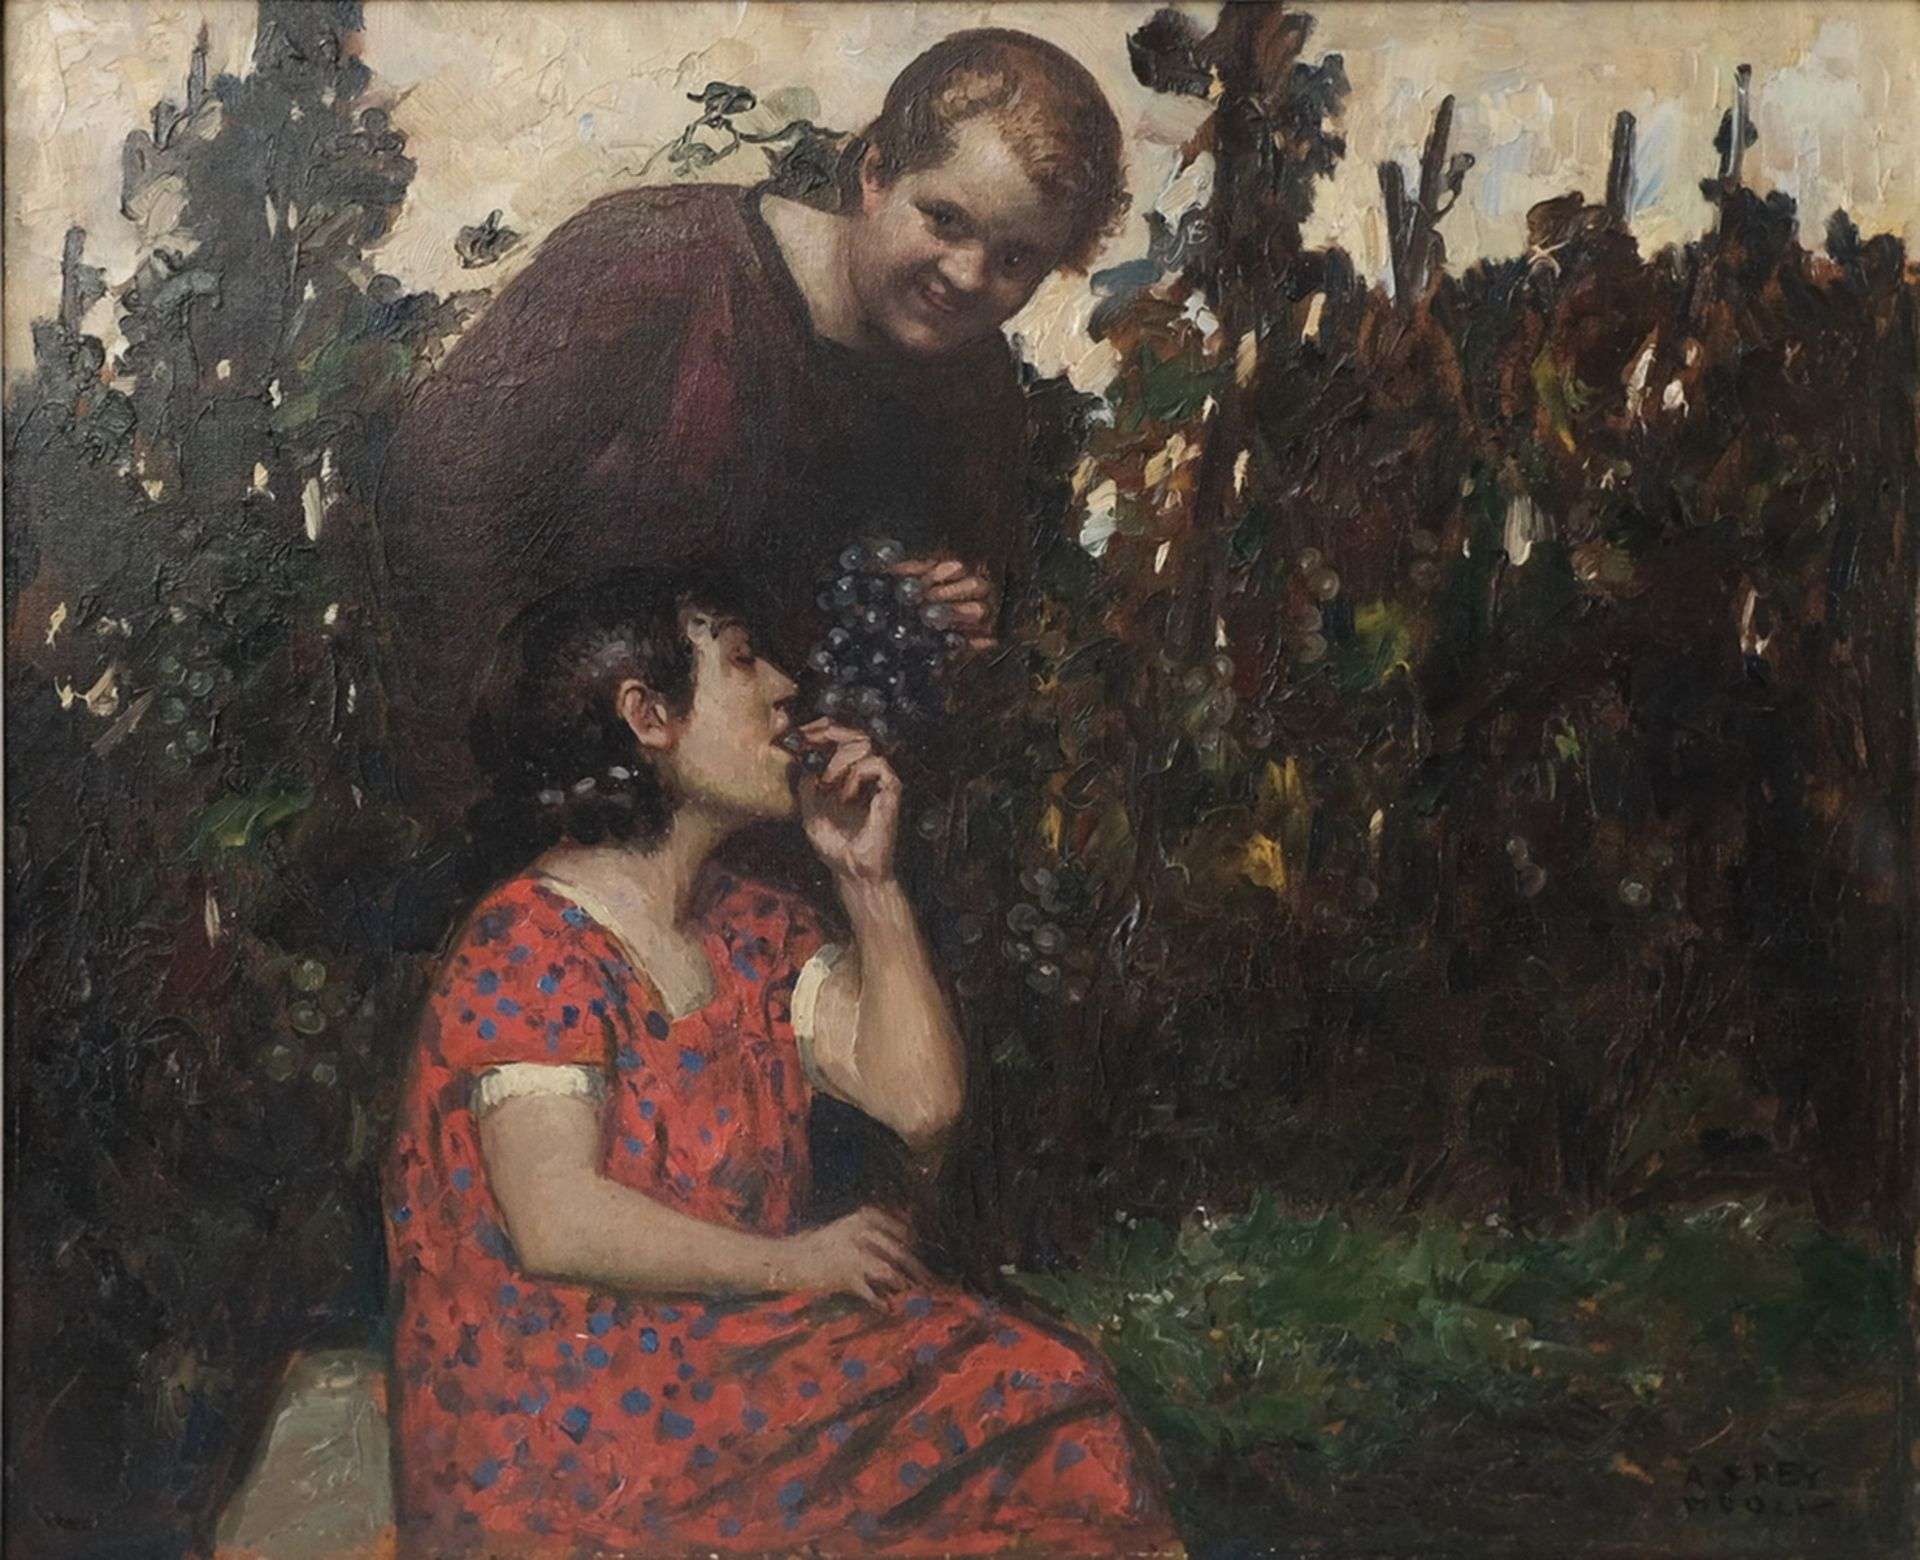 Frey-Moock, Adolf. Grapevine. [The first half of the ХХ century]. Oil on canvas. 50,5x60 cm.<br>Sign - Bild 2 aus 4